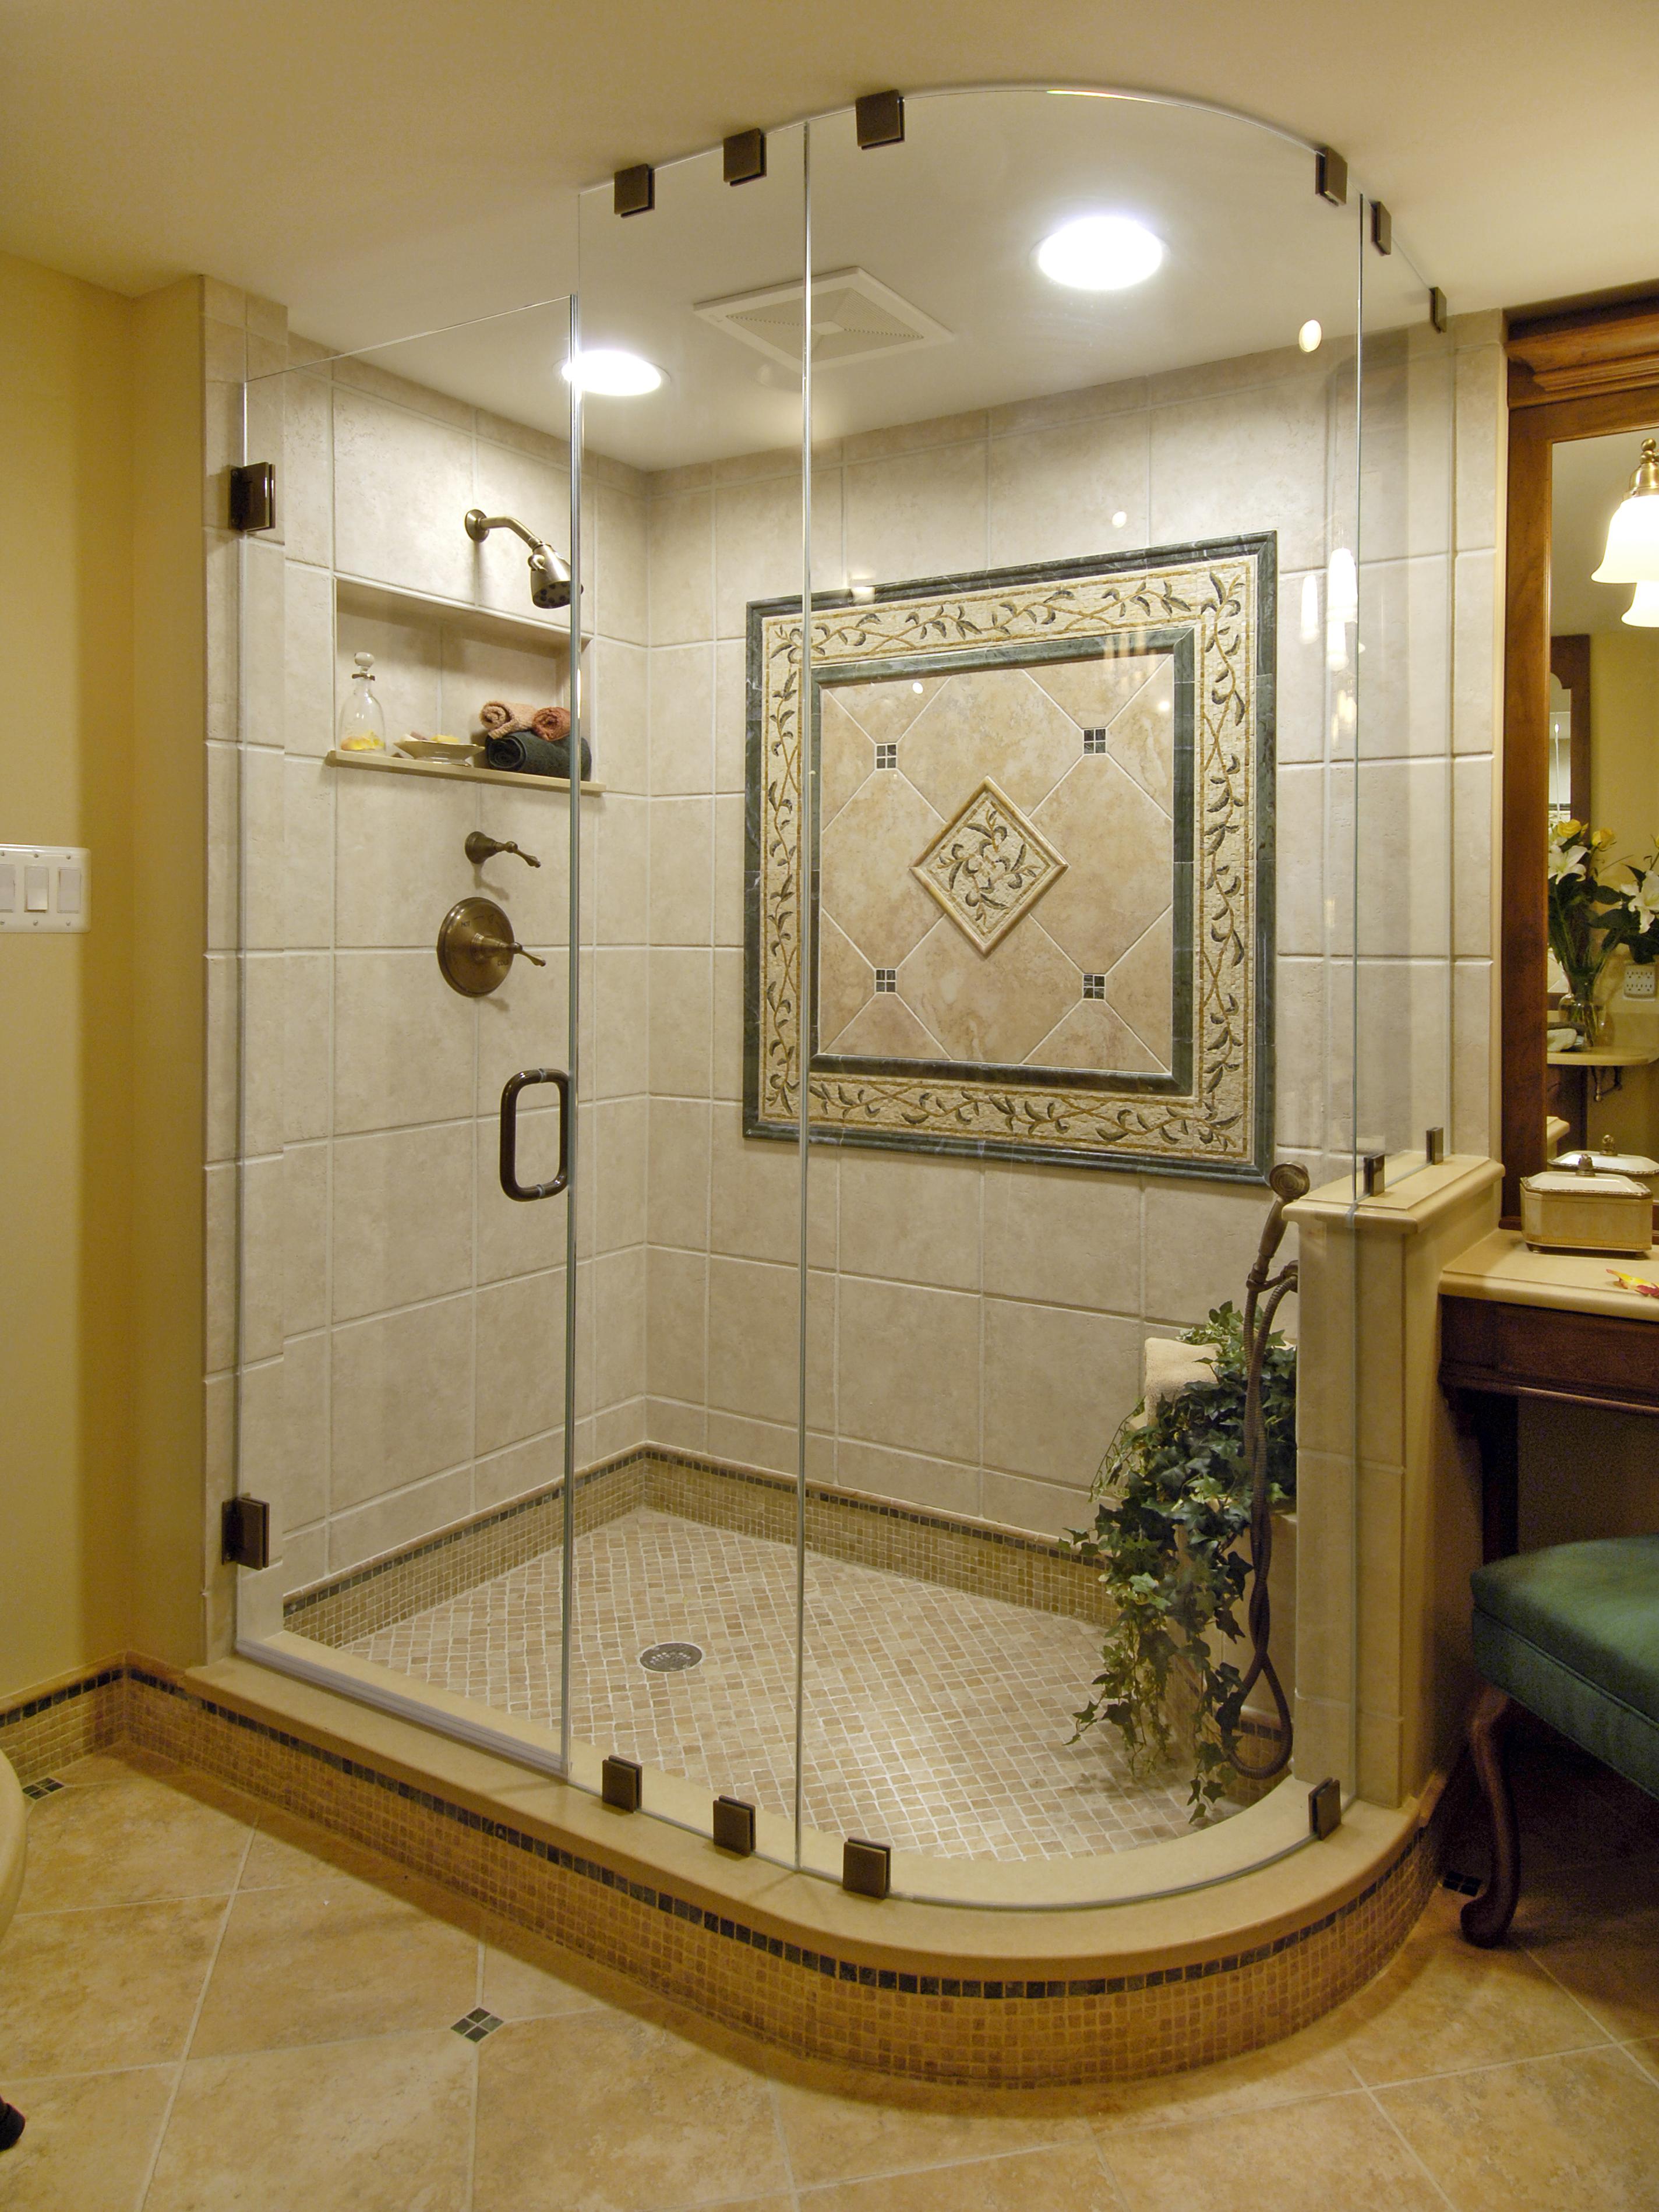 Pretty Painting A Tub Tiny Can U Paint A Bathtub Flat Tub Reglazing Bath Tub Pics Old Bathtub Resurface Cost WhiteBathroom Tile Reglazing Cost Soaking Tub Designs: Pictures, Ideas \u0026 Tips From HGTV | HGTV